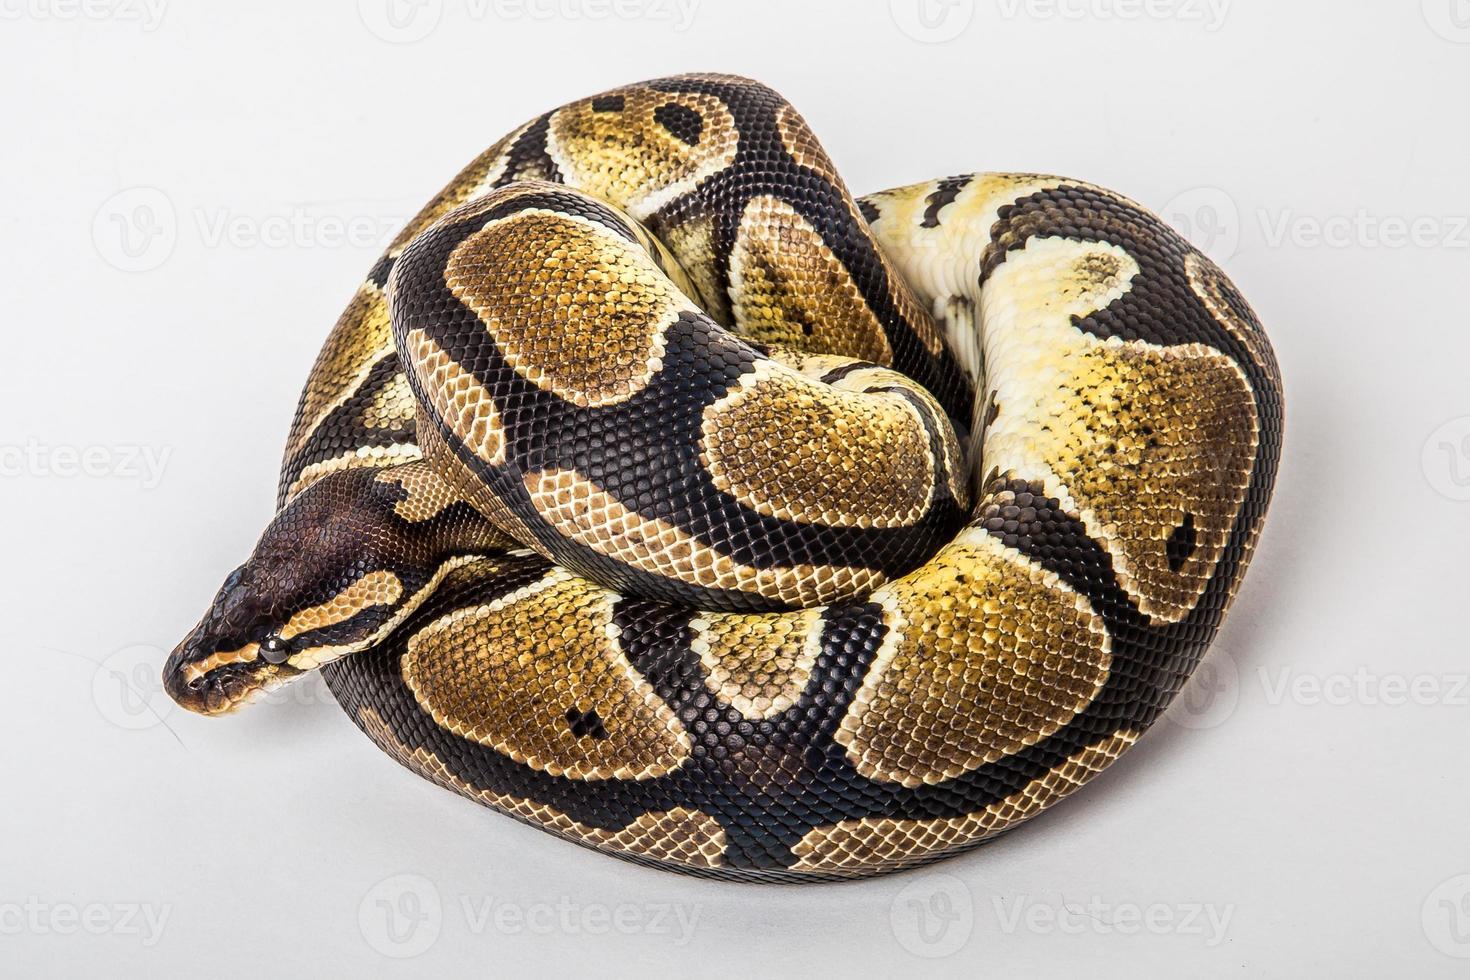 Ball Python foto